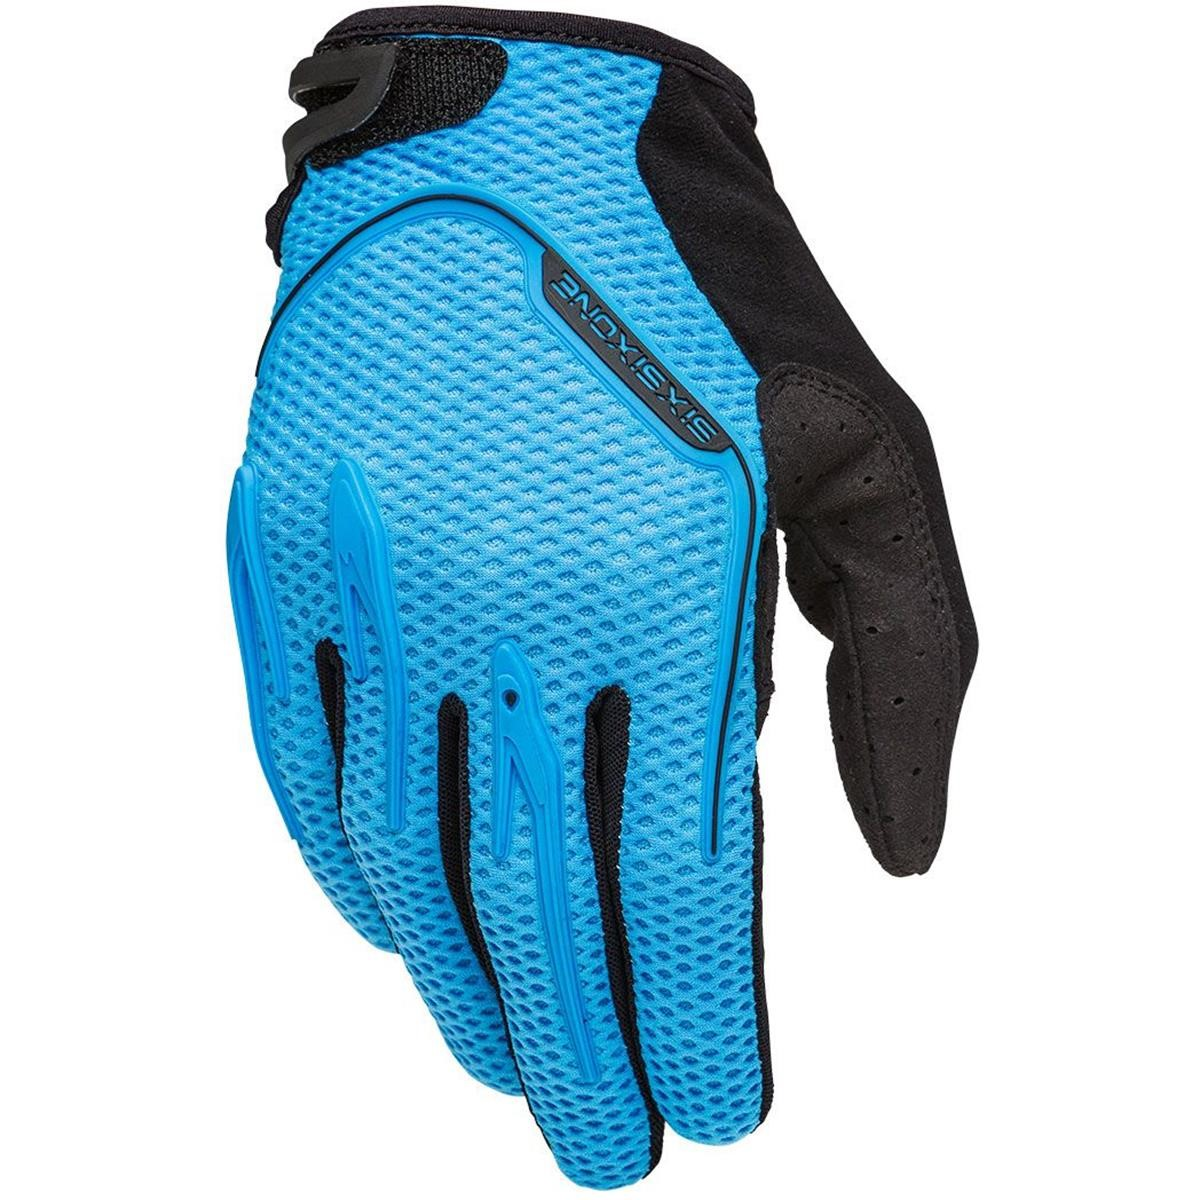 SixSixOne Handschuhe 661 Recon, XL, Blau